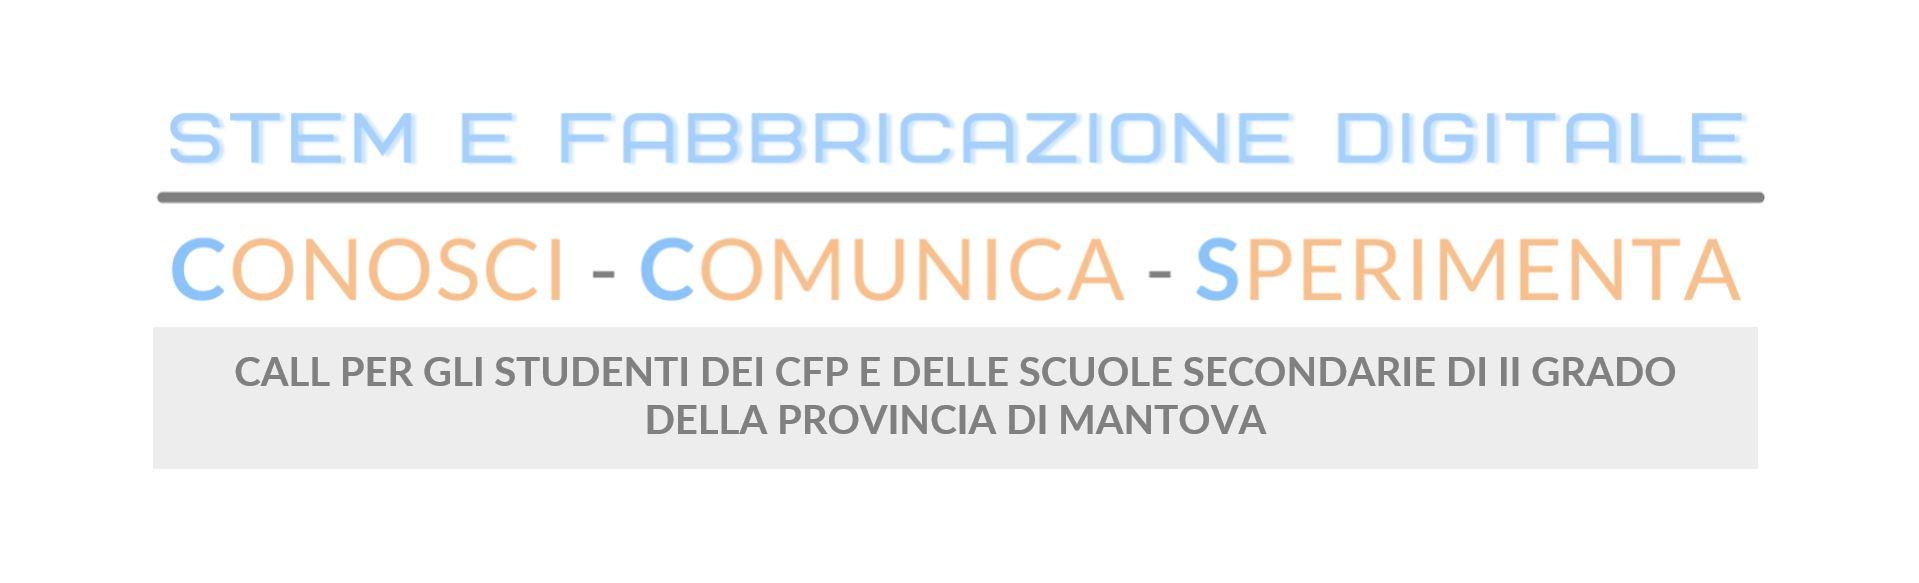 STEM e Fabbricazione Digitale: Conosci, Comunica e Sperimenta – call per CFP e scuole secondarie di II grado